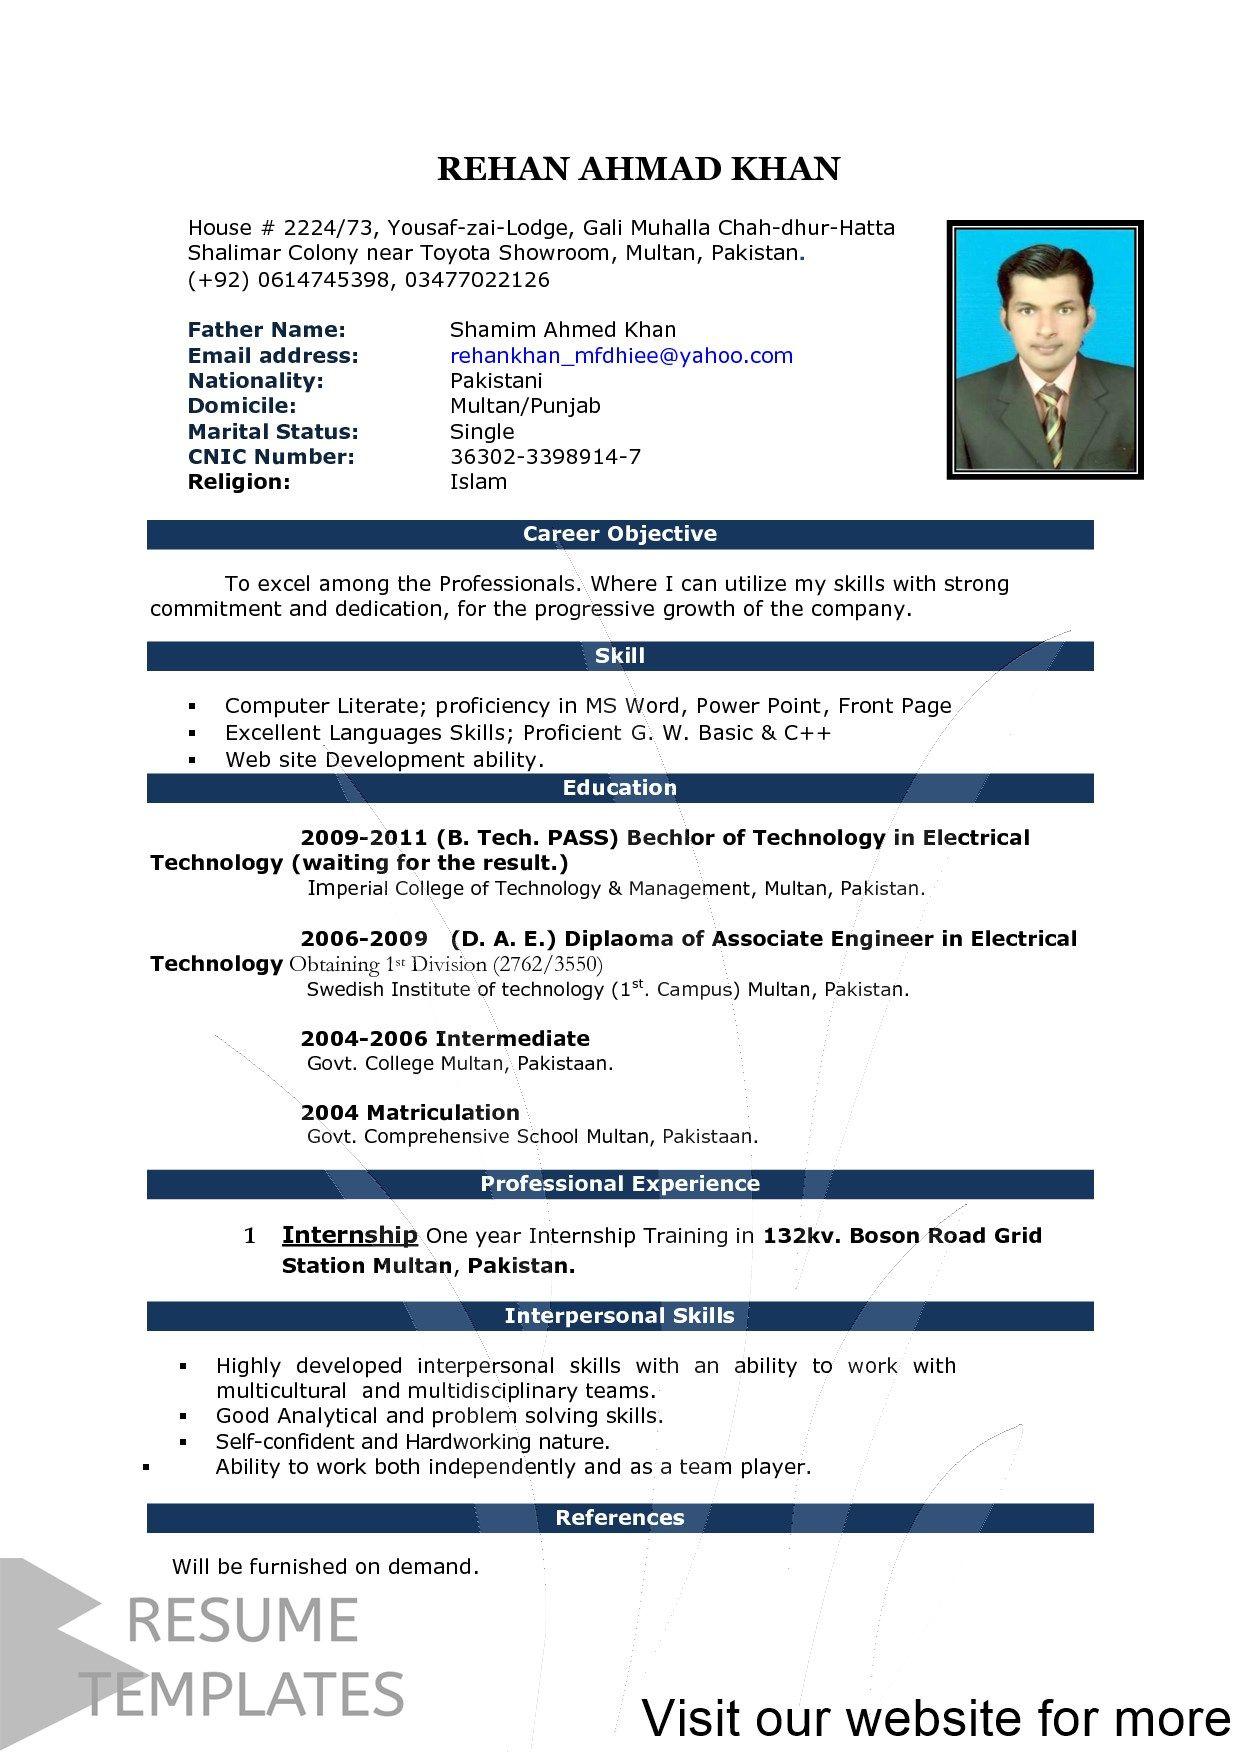 Resume Template Creator Professional In 2020 Resume Template